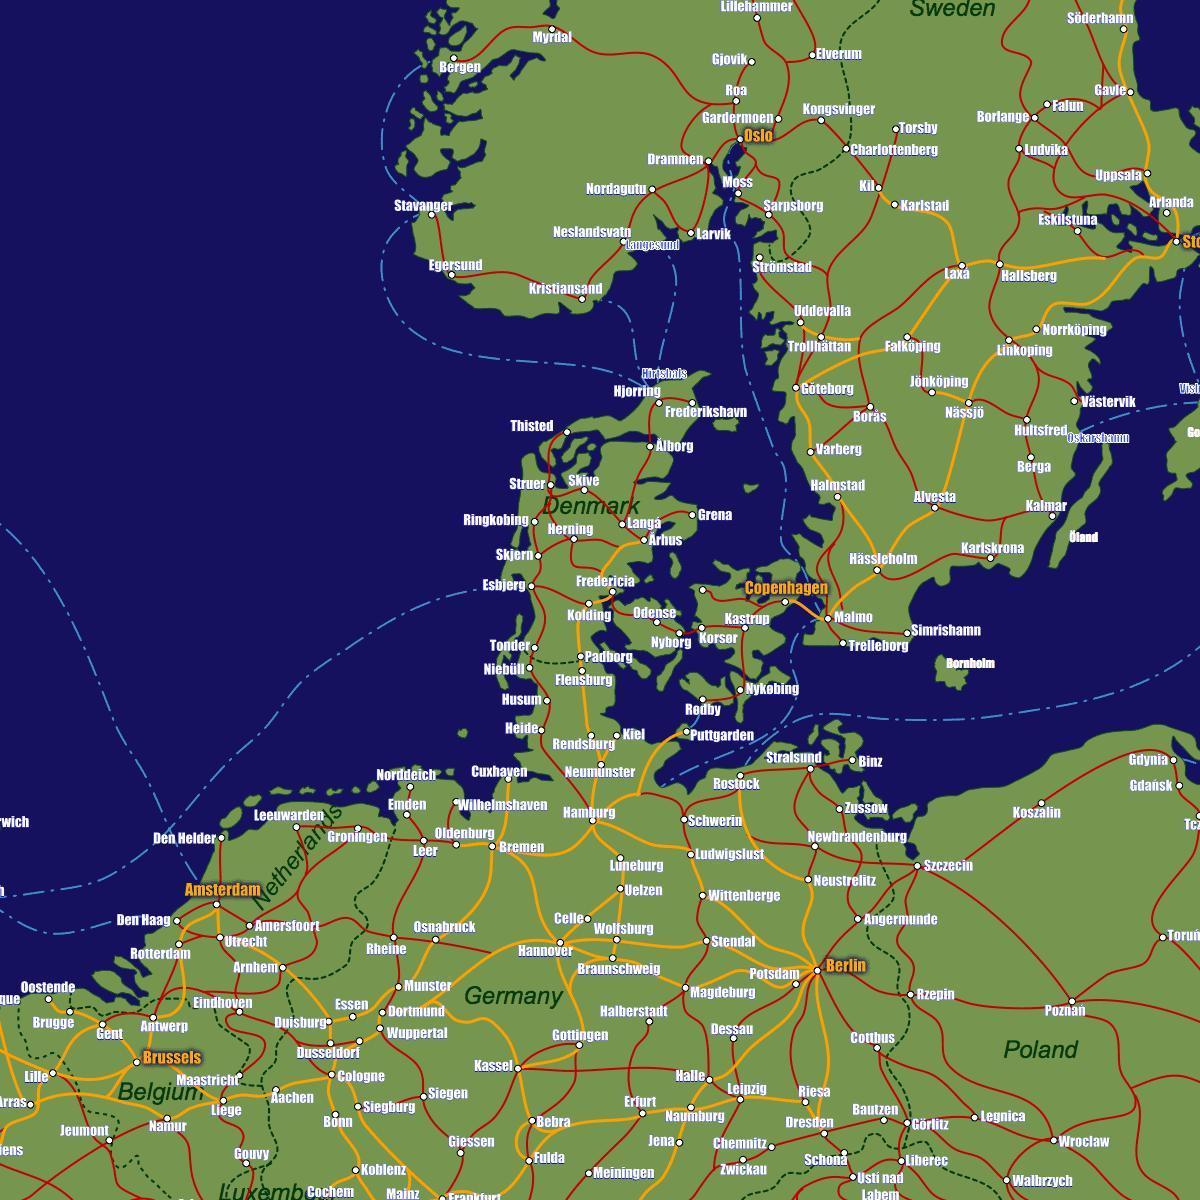 Tanska Juna Kartta Tanska Rail Kartta Pohjois Eurooppa Eurooppa